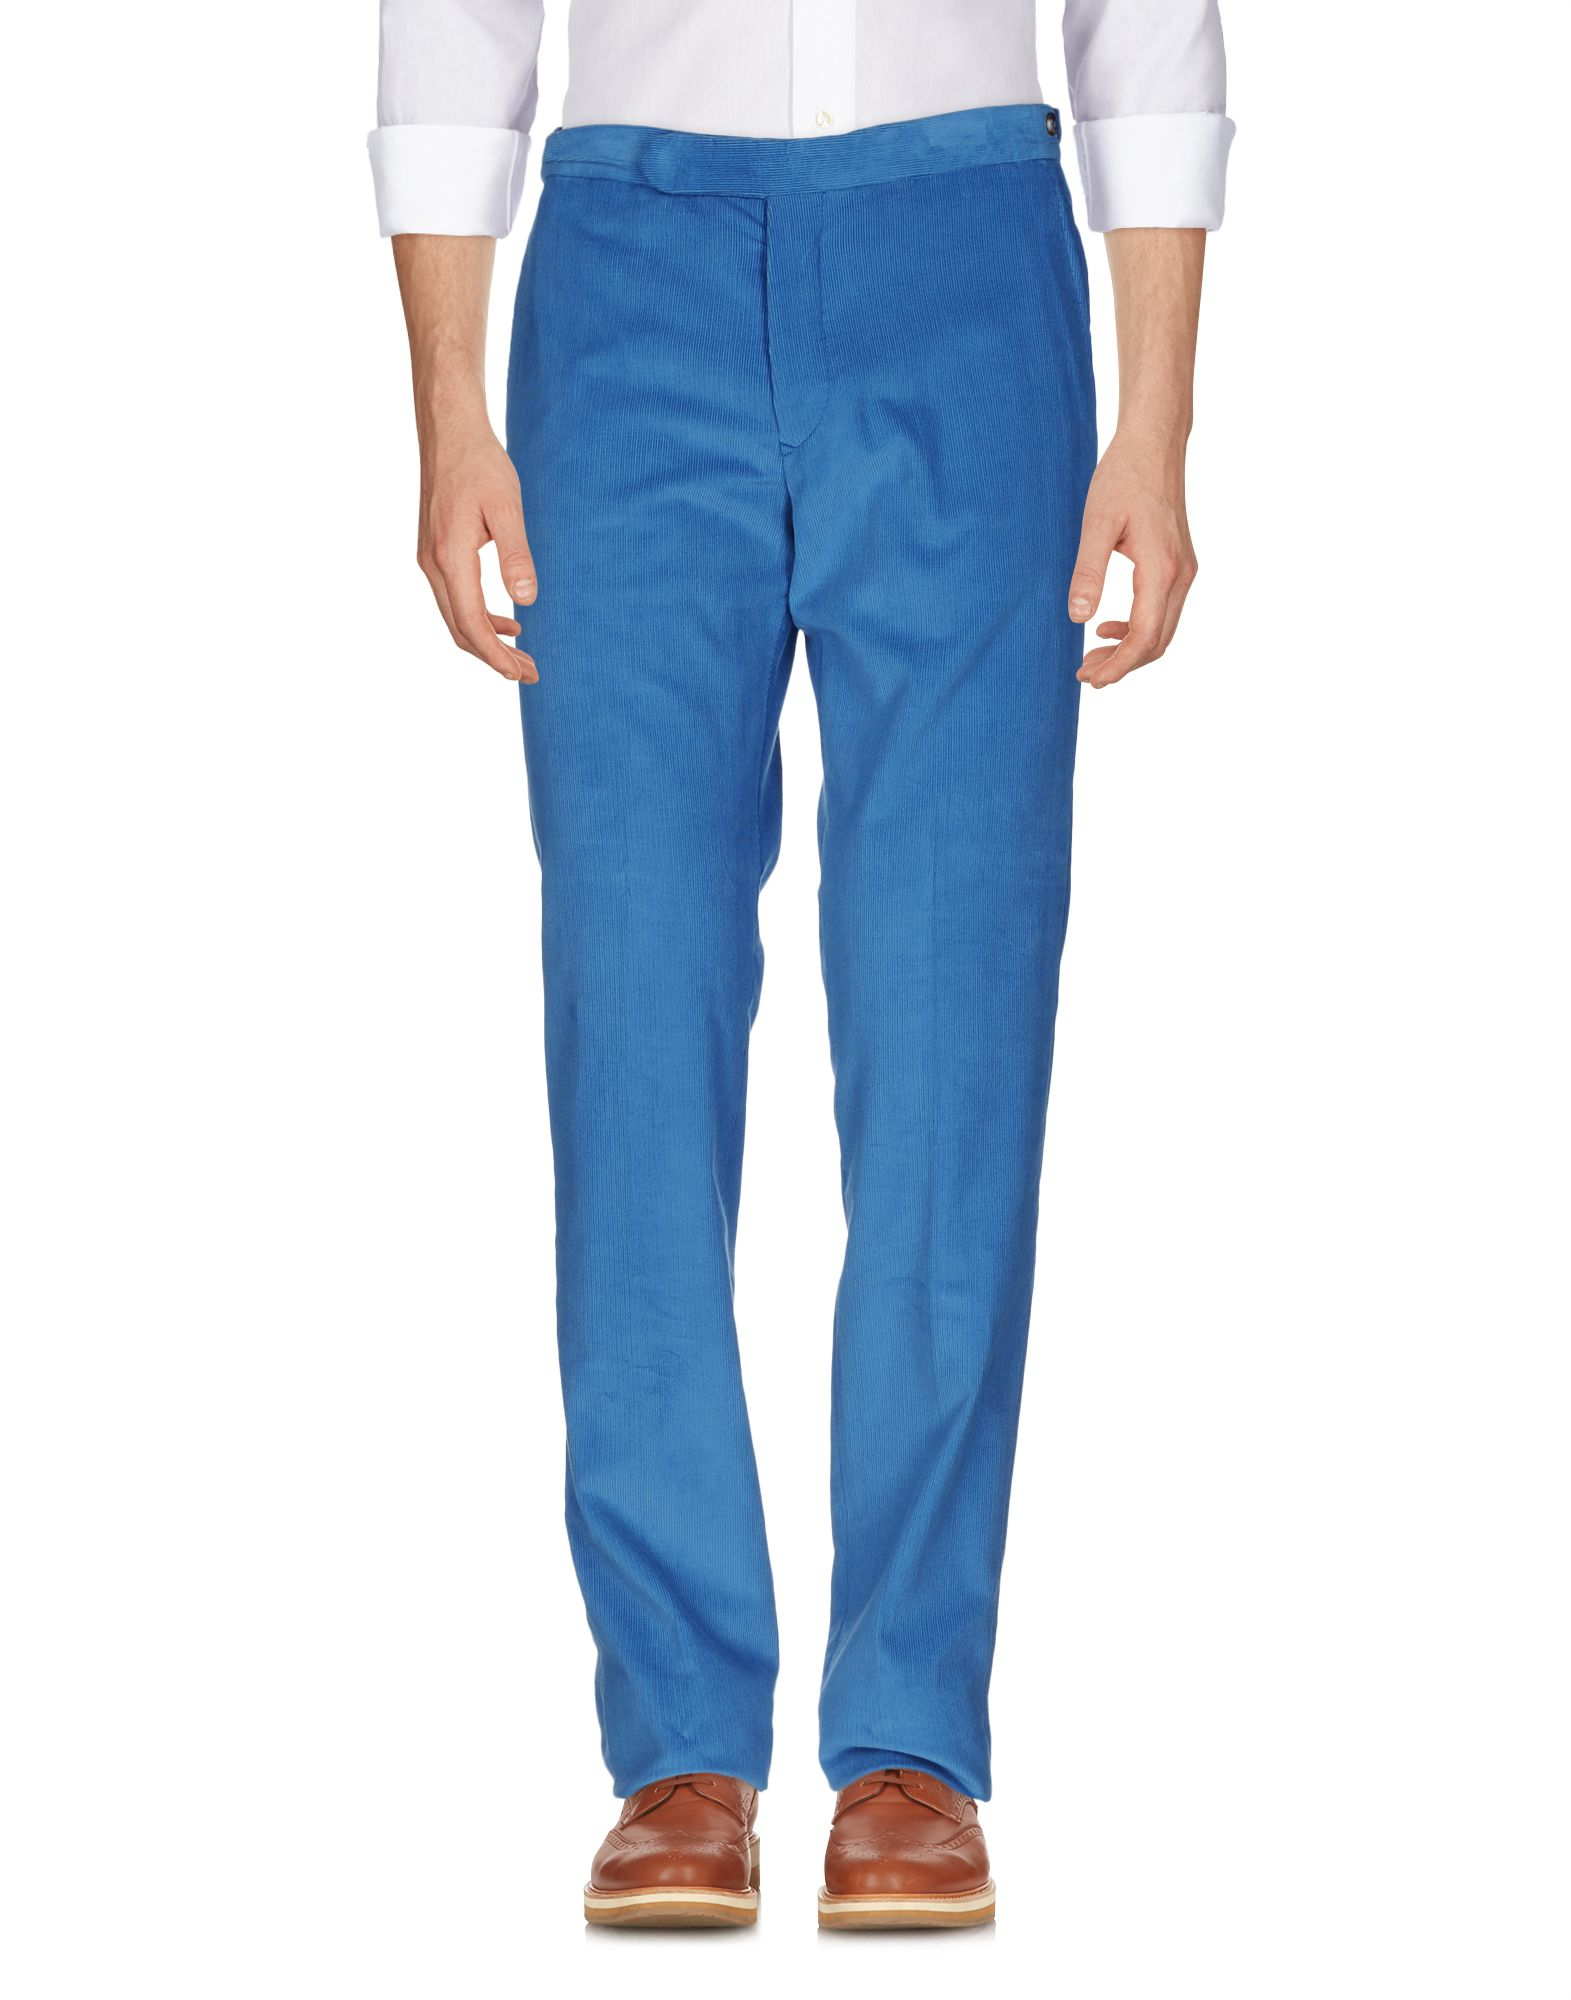 C&C PANTALONI Повседневные брюки 5pcs lot bd9329 9329 d9329 ic free shipping